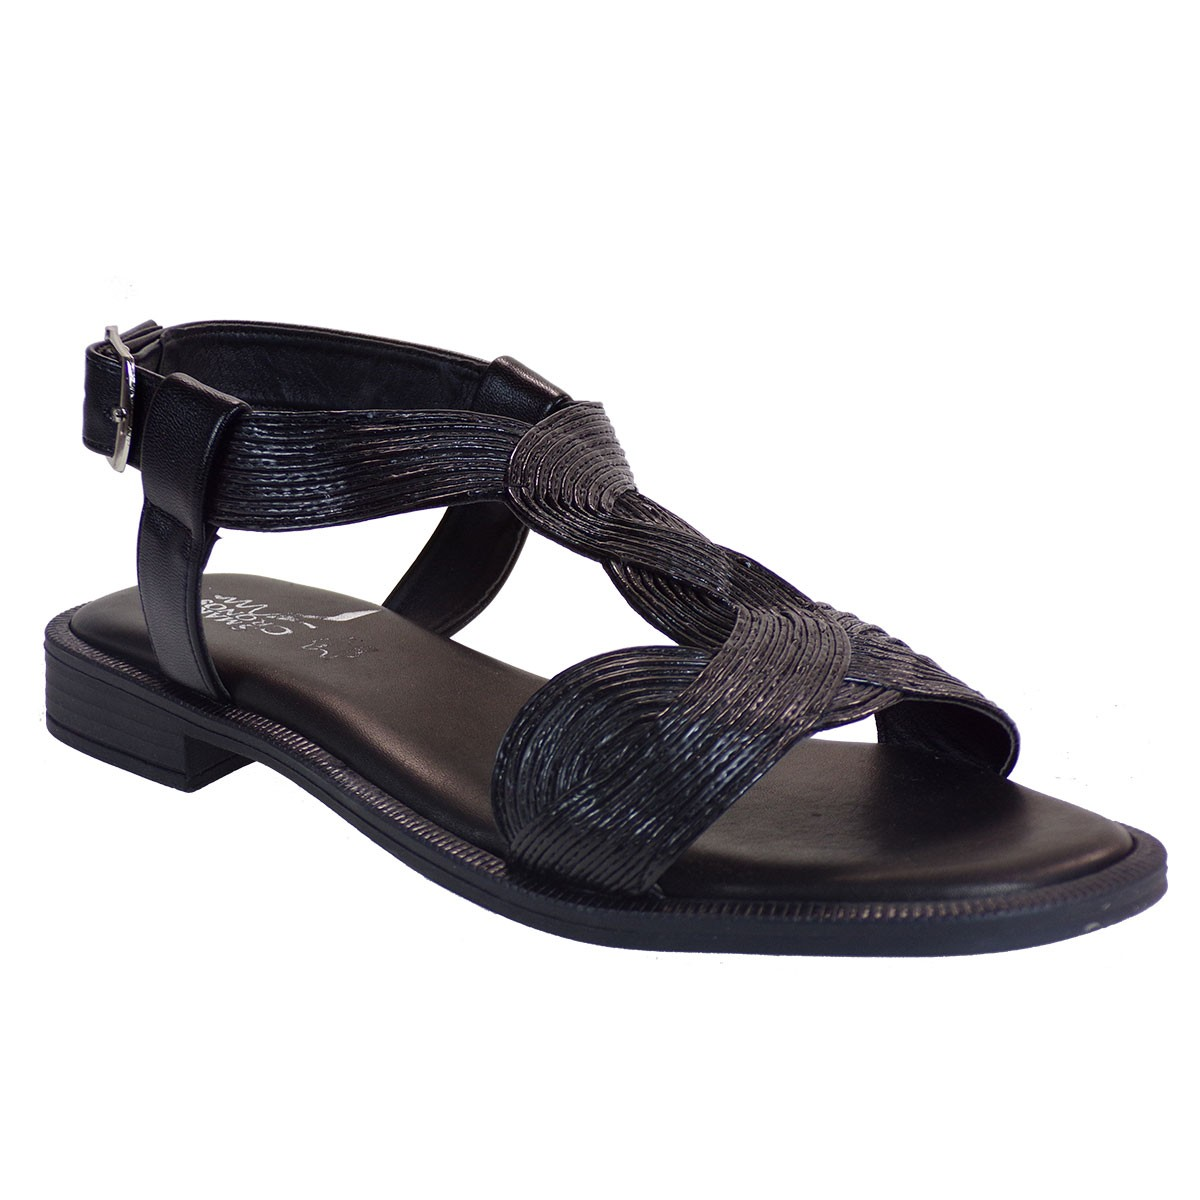 Smart Cronos Γυναικεία Παπούτσια Πέδιλα 7110-1085 Μαύρο Μπαμπού